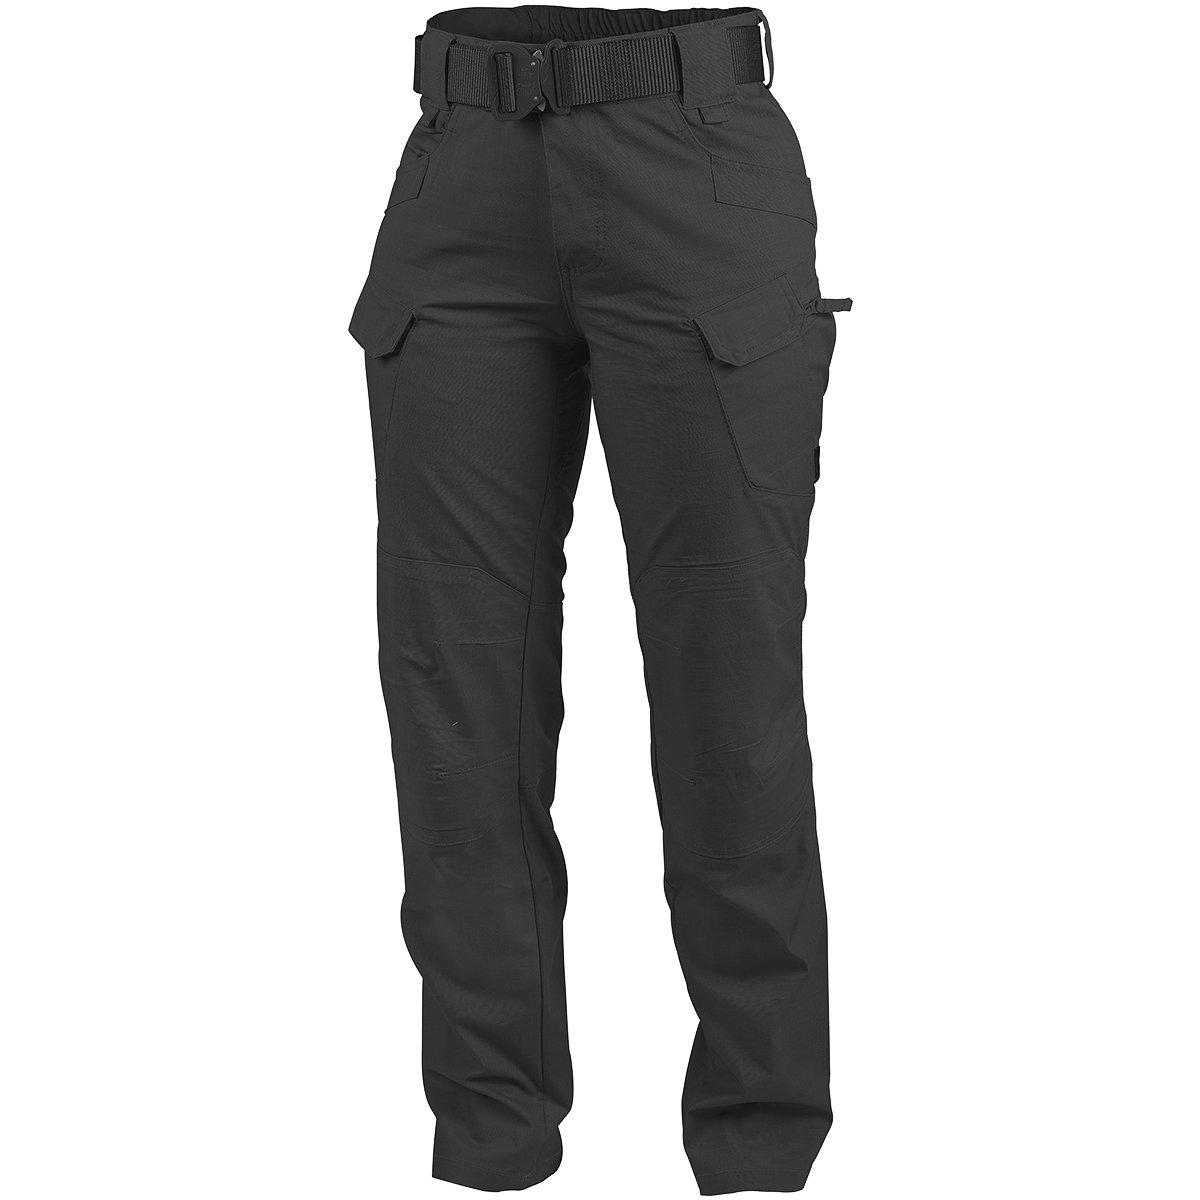 Helikon Women's UTP Trousers Black Polycotton Ripstop Size 32/34